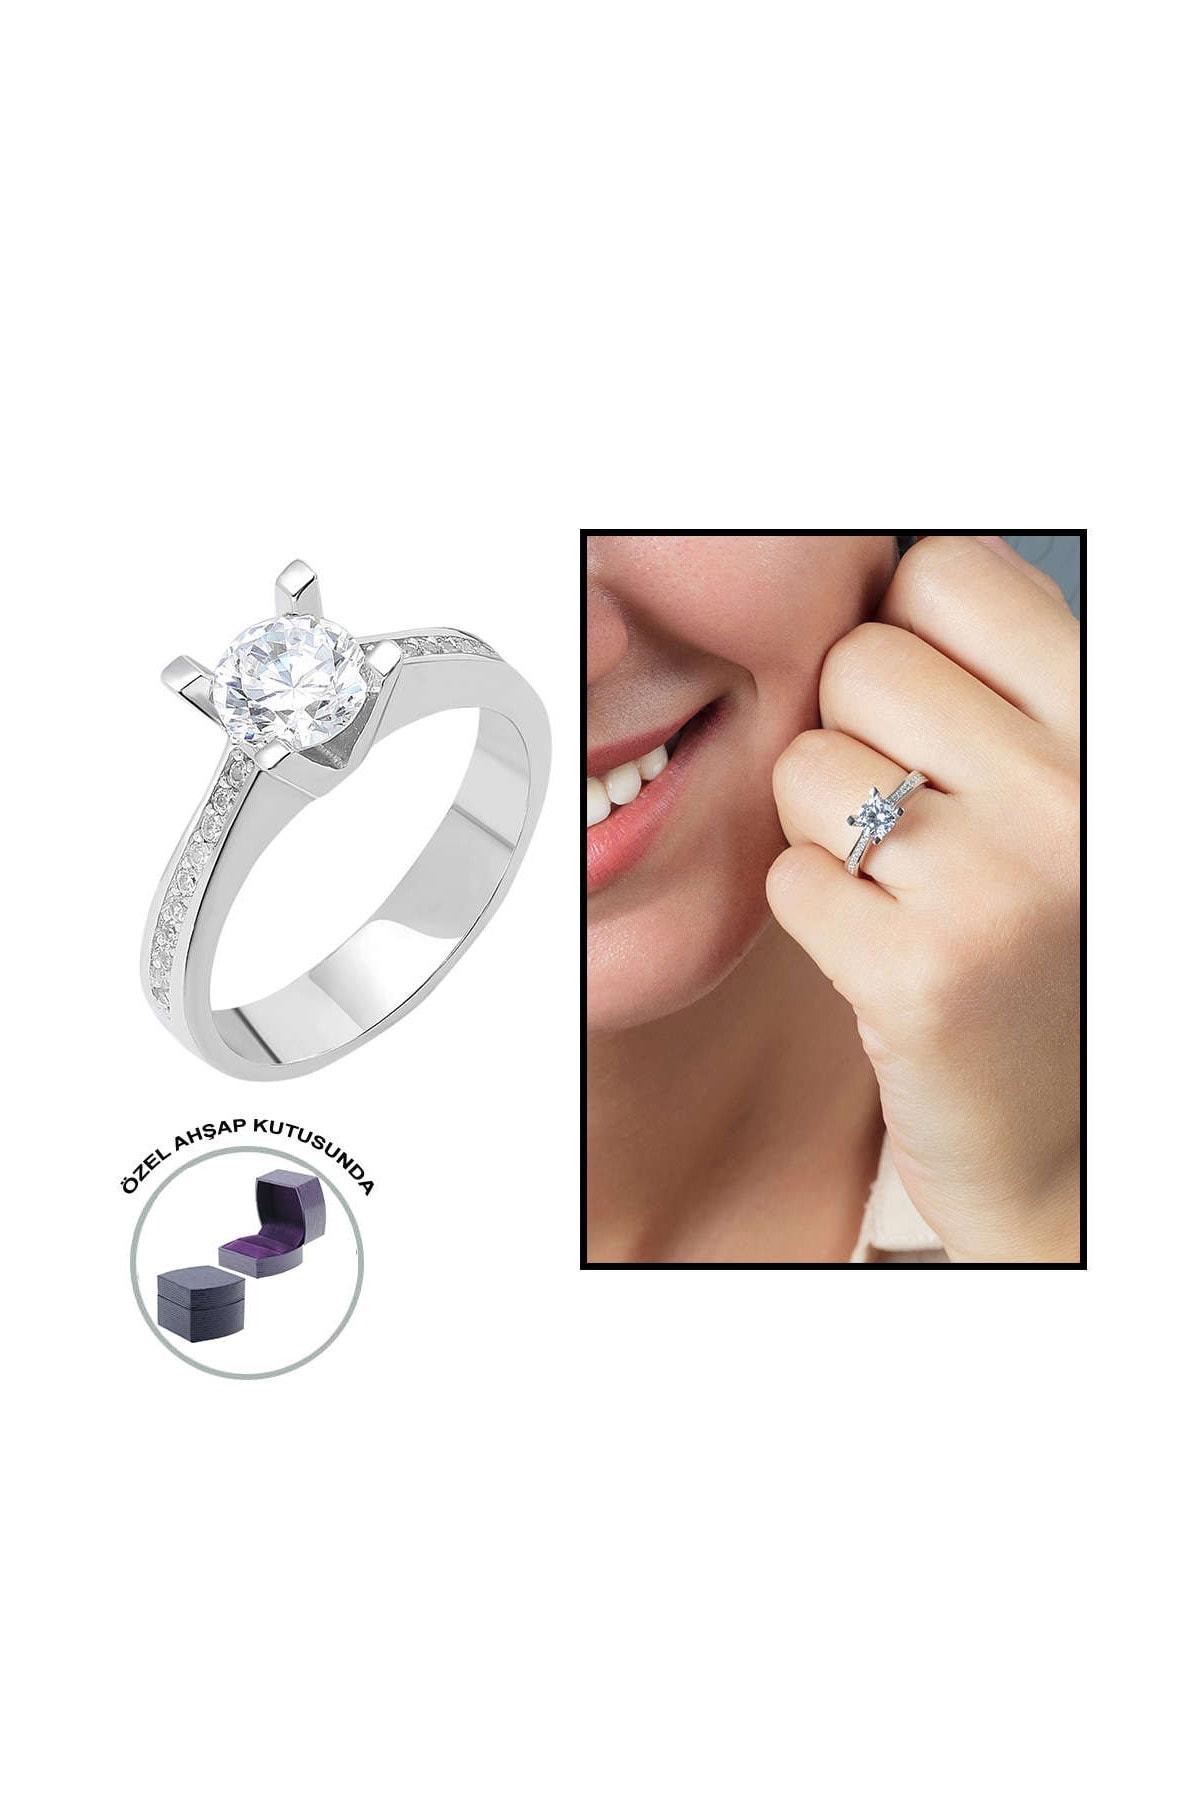 "Tesbihane Starlight Diamond Pırlanta Montür ""V"" Tasarım 925 Ayar Gümüş Bayan Tektaş Yüzük 102001797"